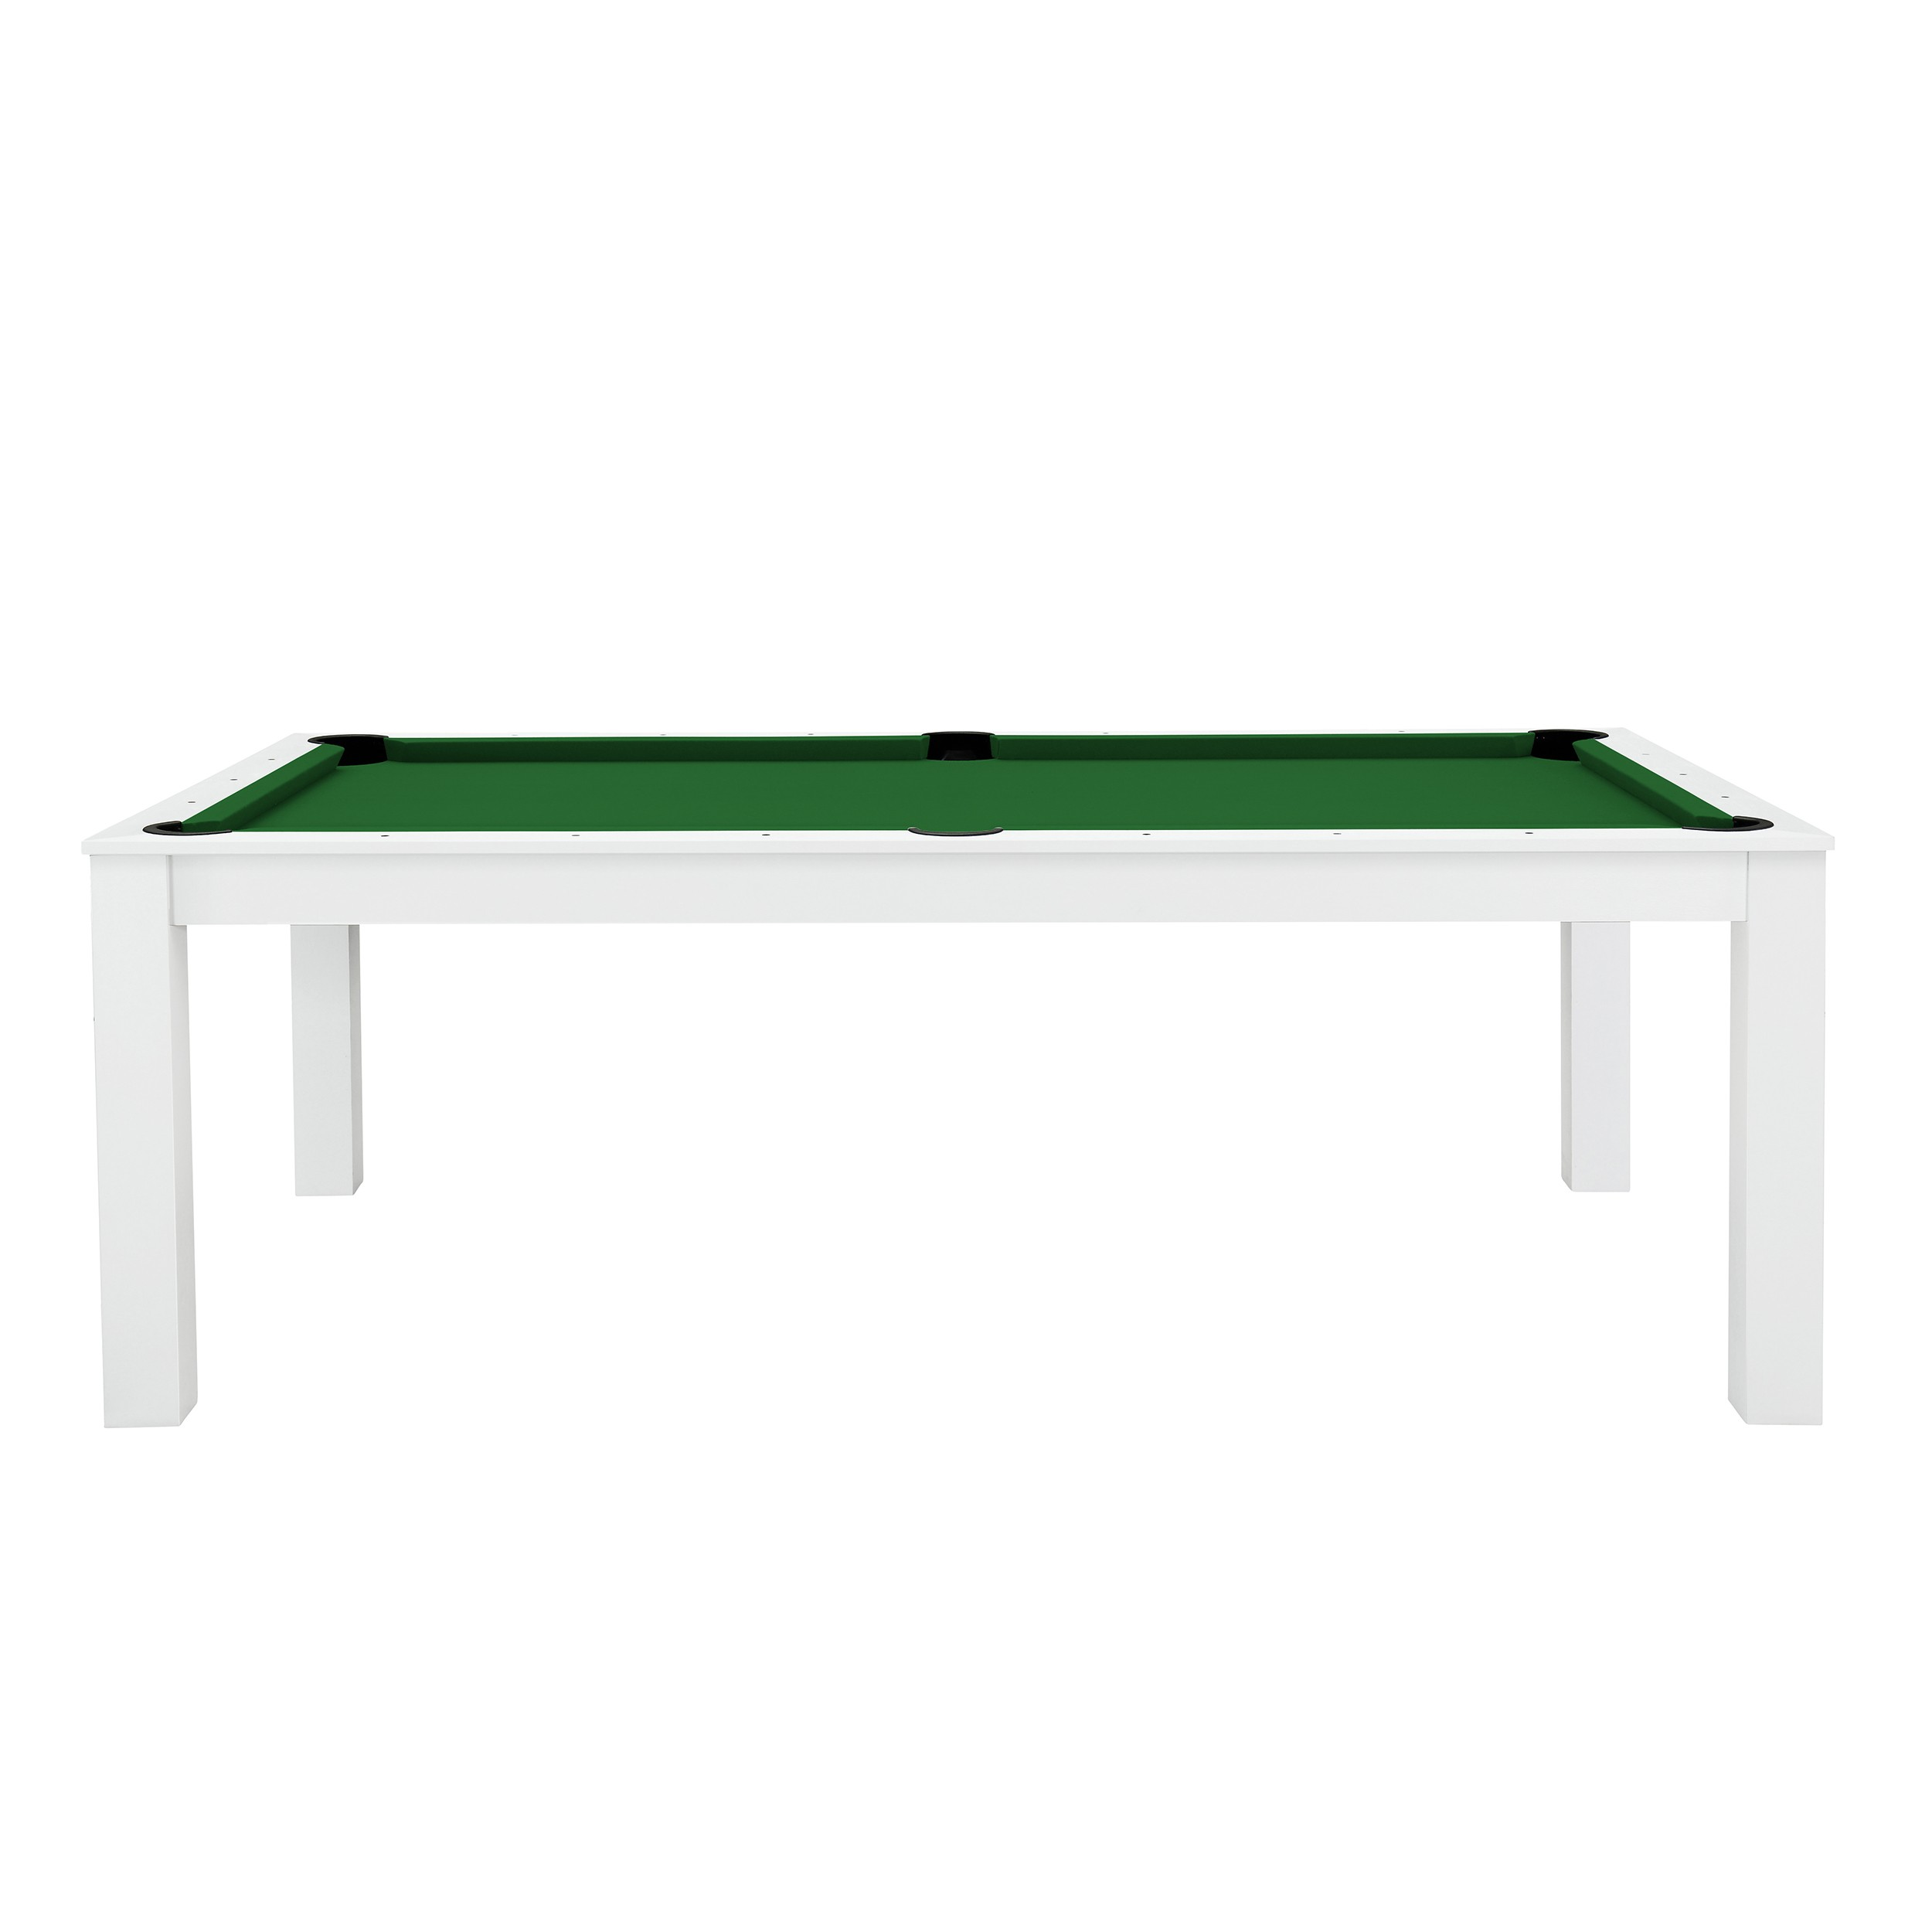 billard table convertible blanc tapis vert installez nos billard table convertible blanc tapis. Black Bedroom Furniture Sets. Home Design Ideas